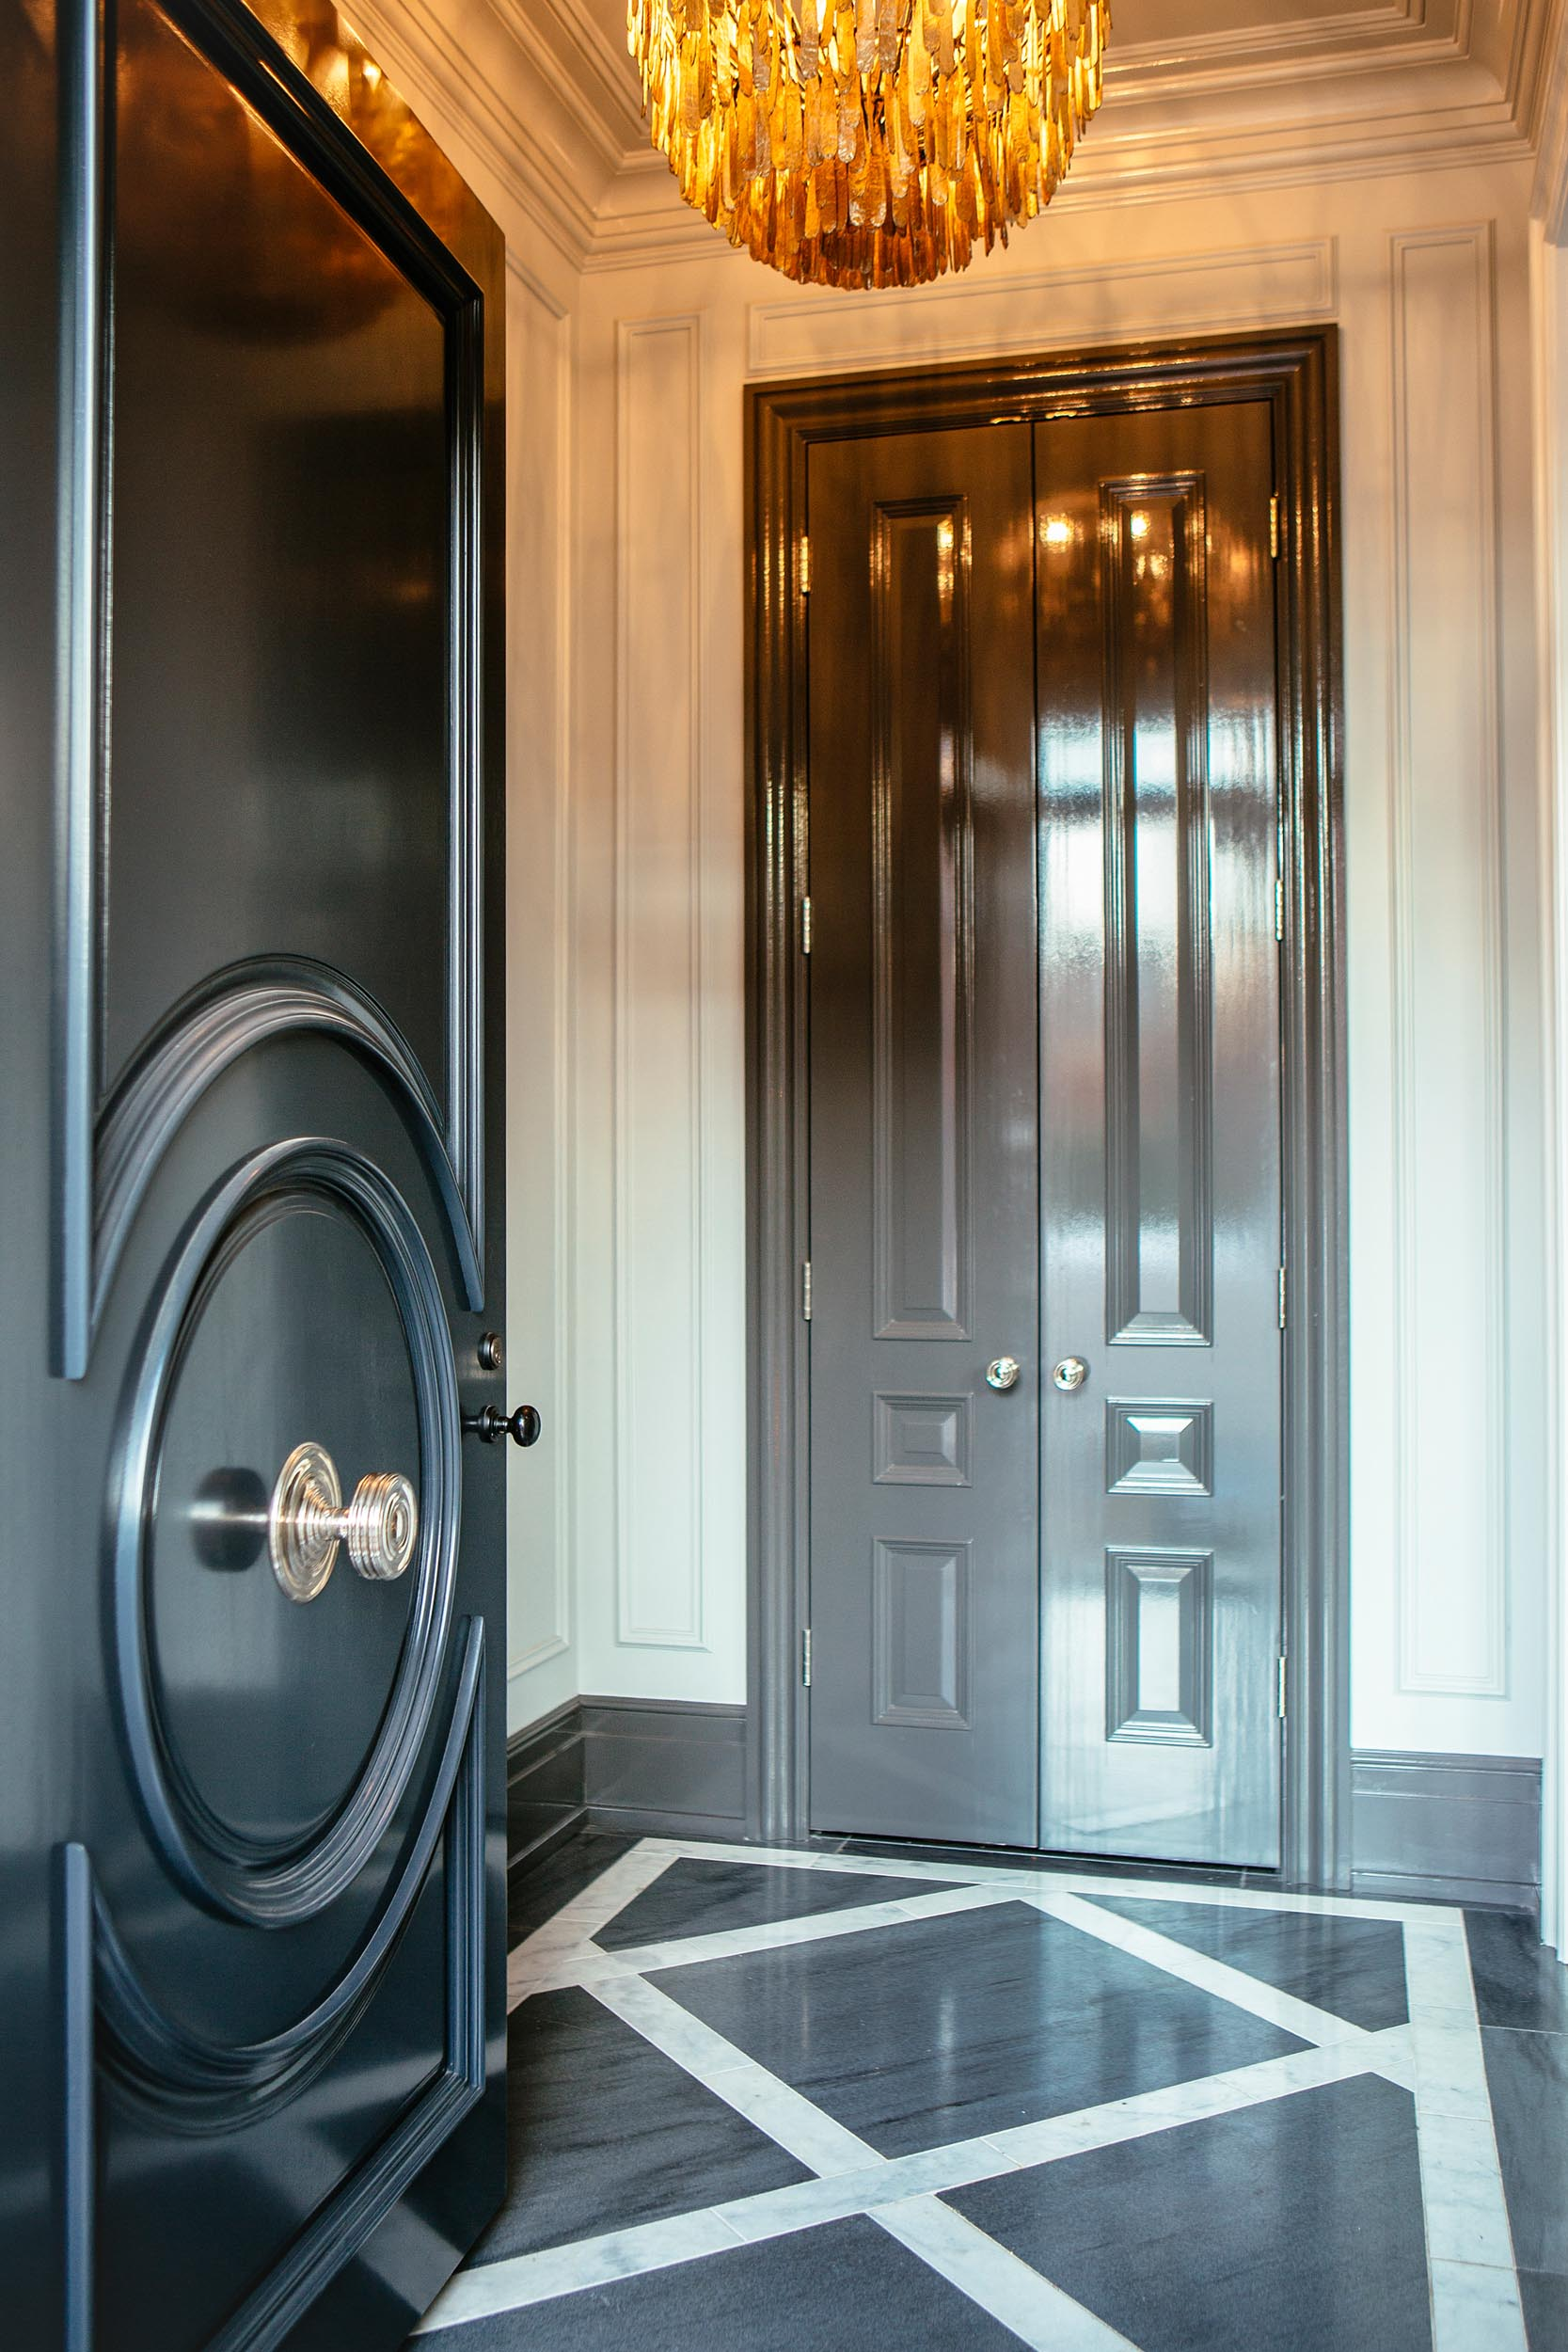 Leo_Designs_Chicago_interior_design_lincoln_park_parisian34.jpg